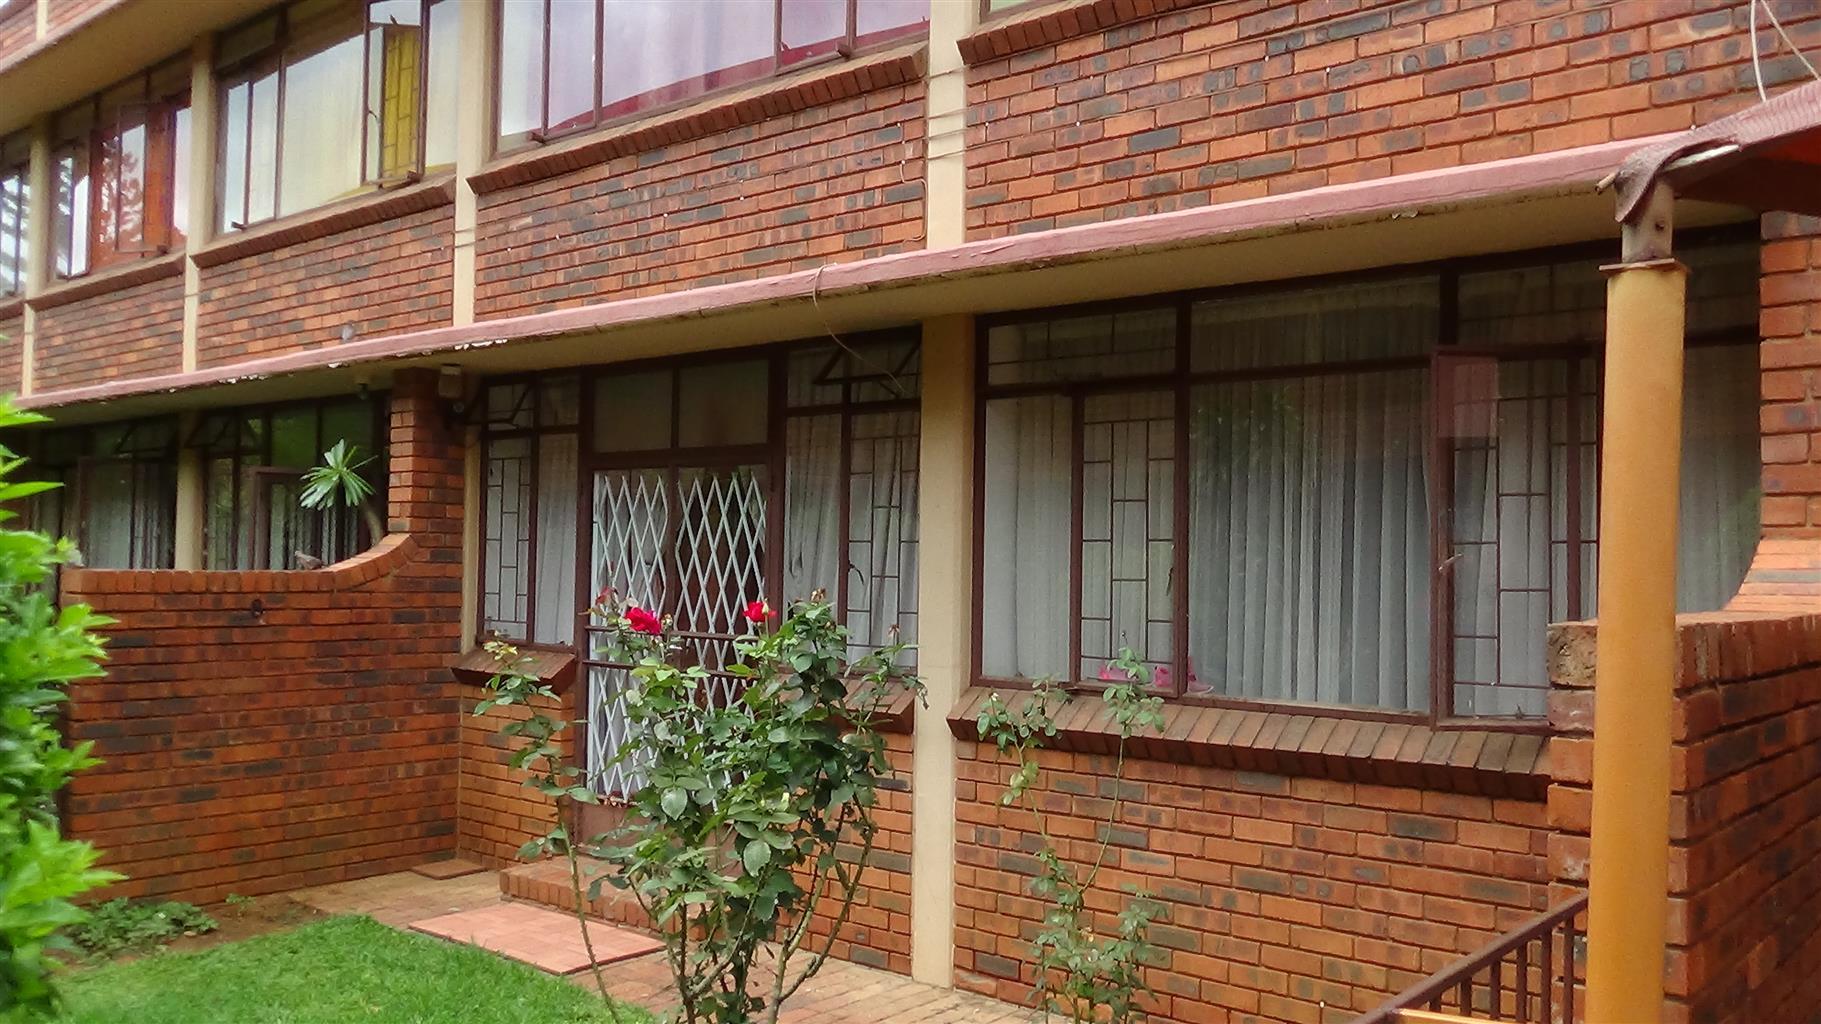 1.5 Bedroom Flat in Pretoria North – R390 000